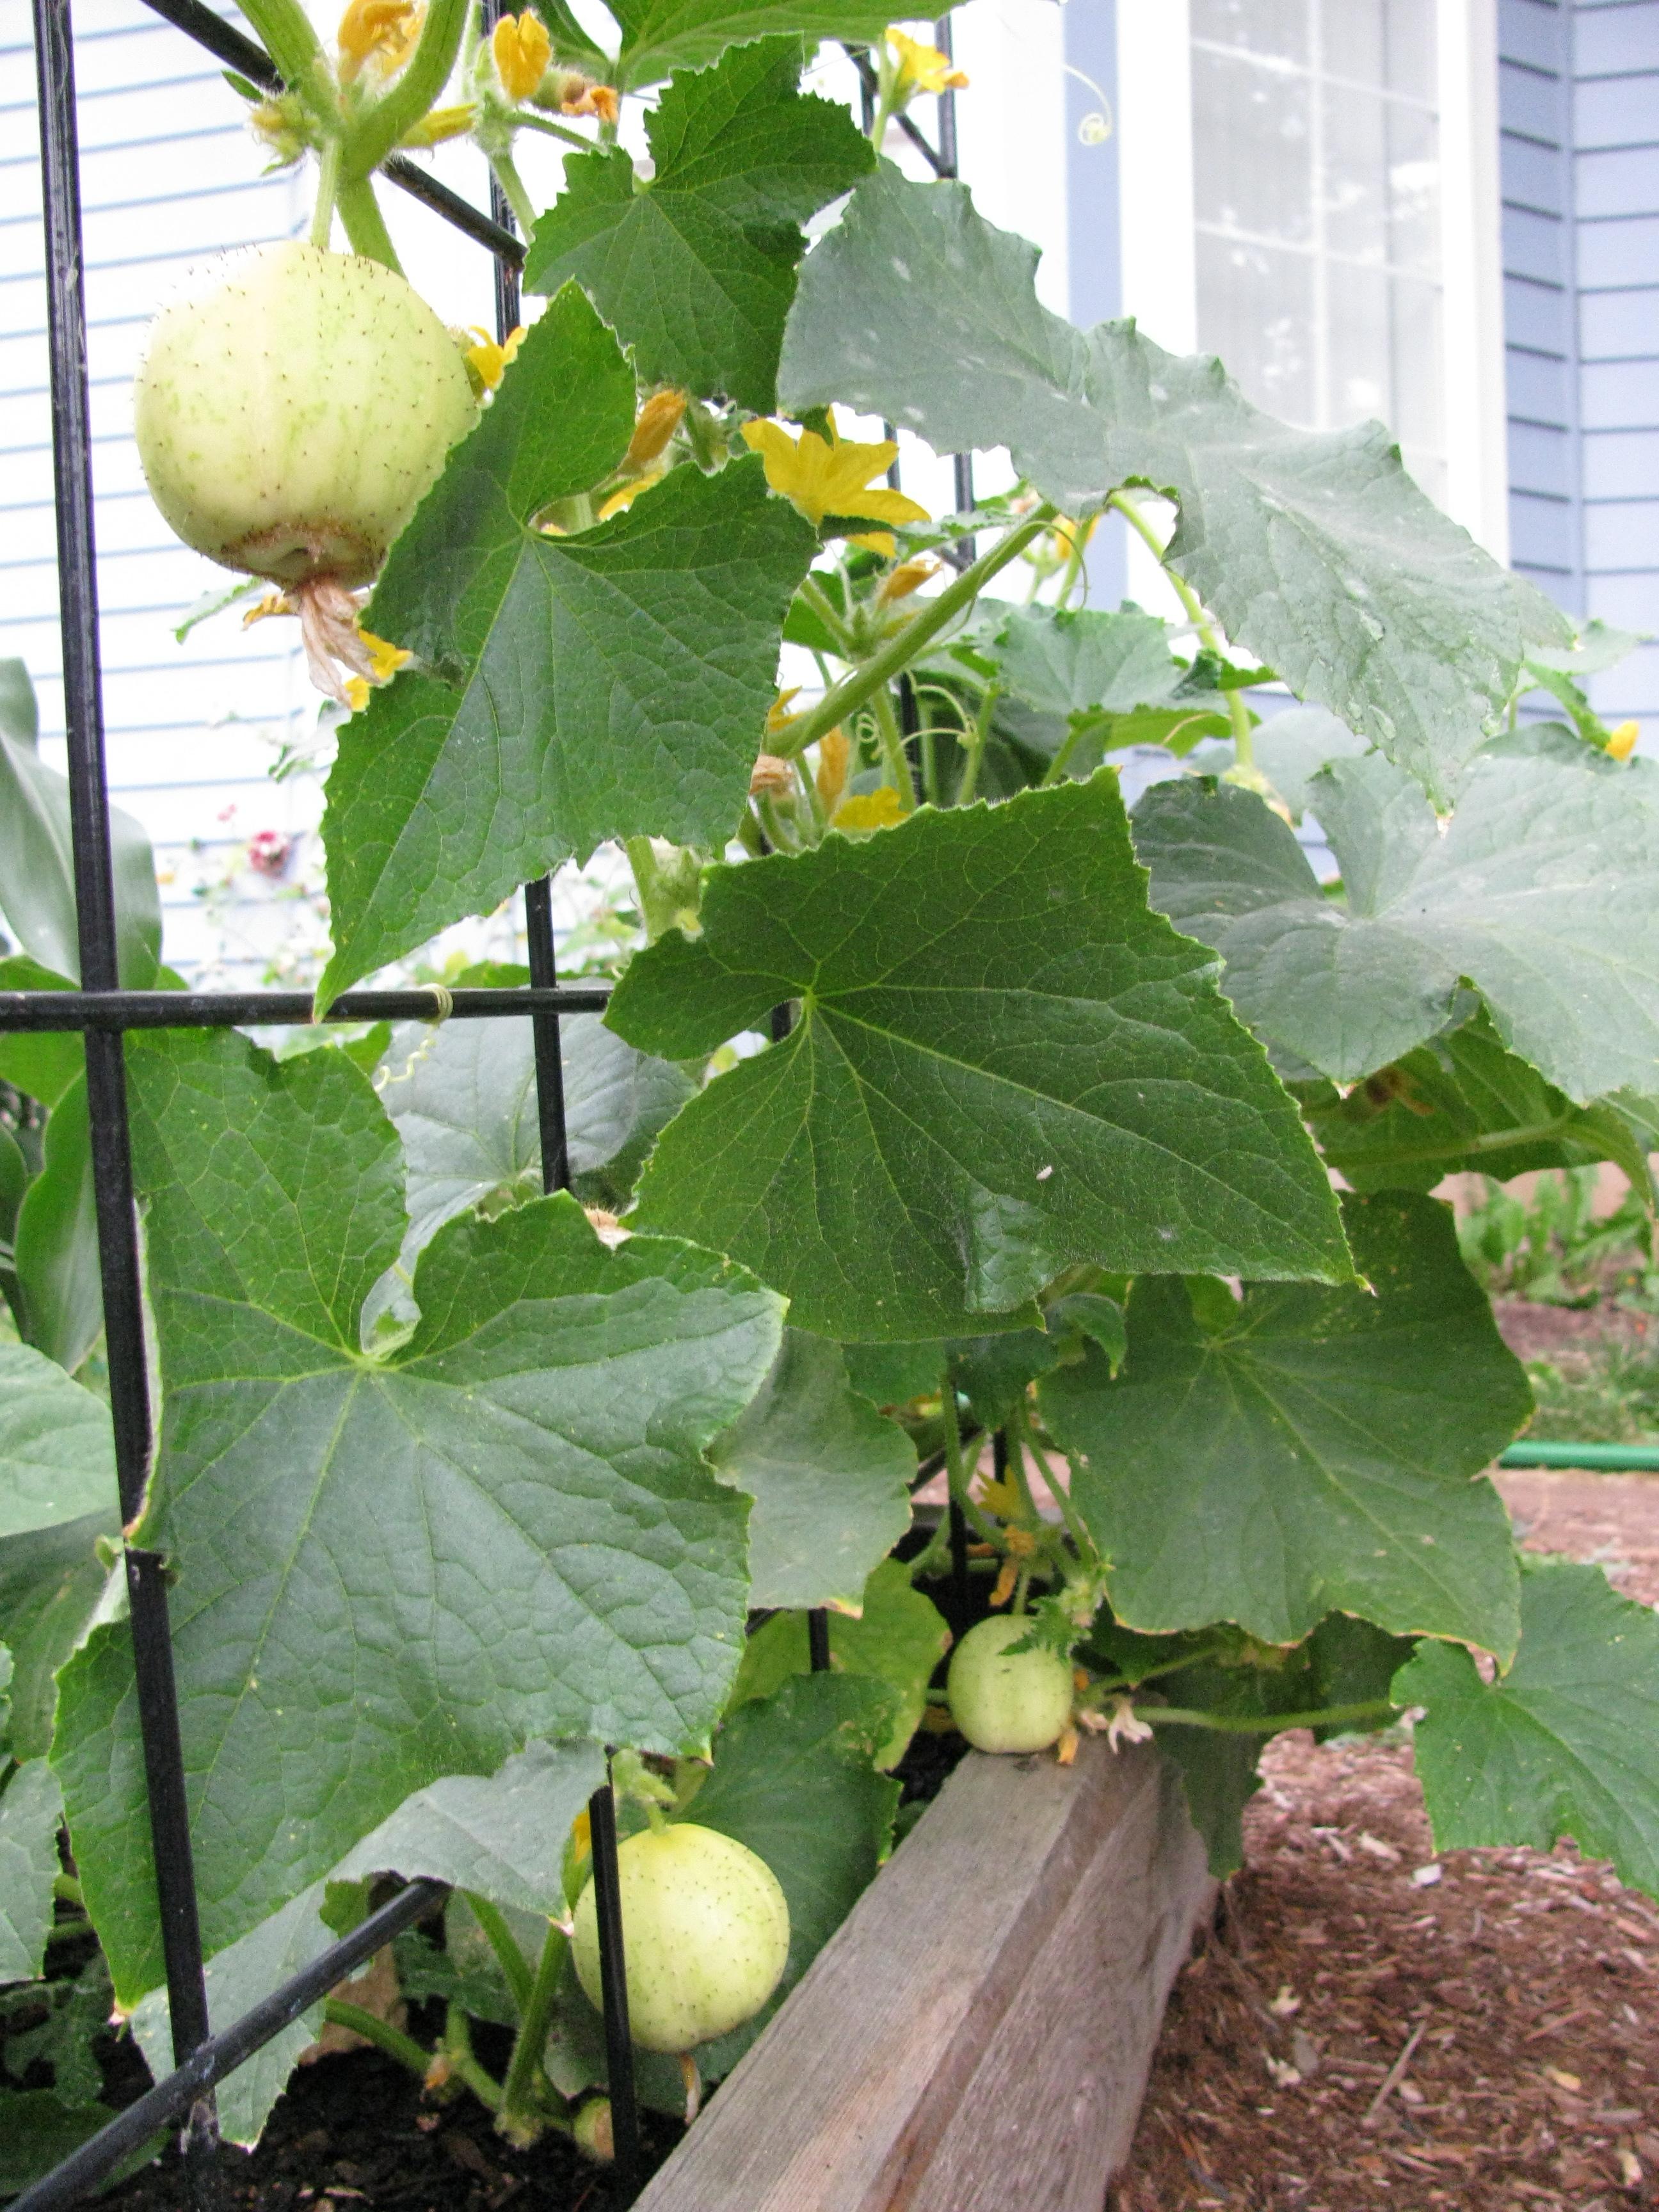 harvest | The Root Cellar's Garden